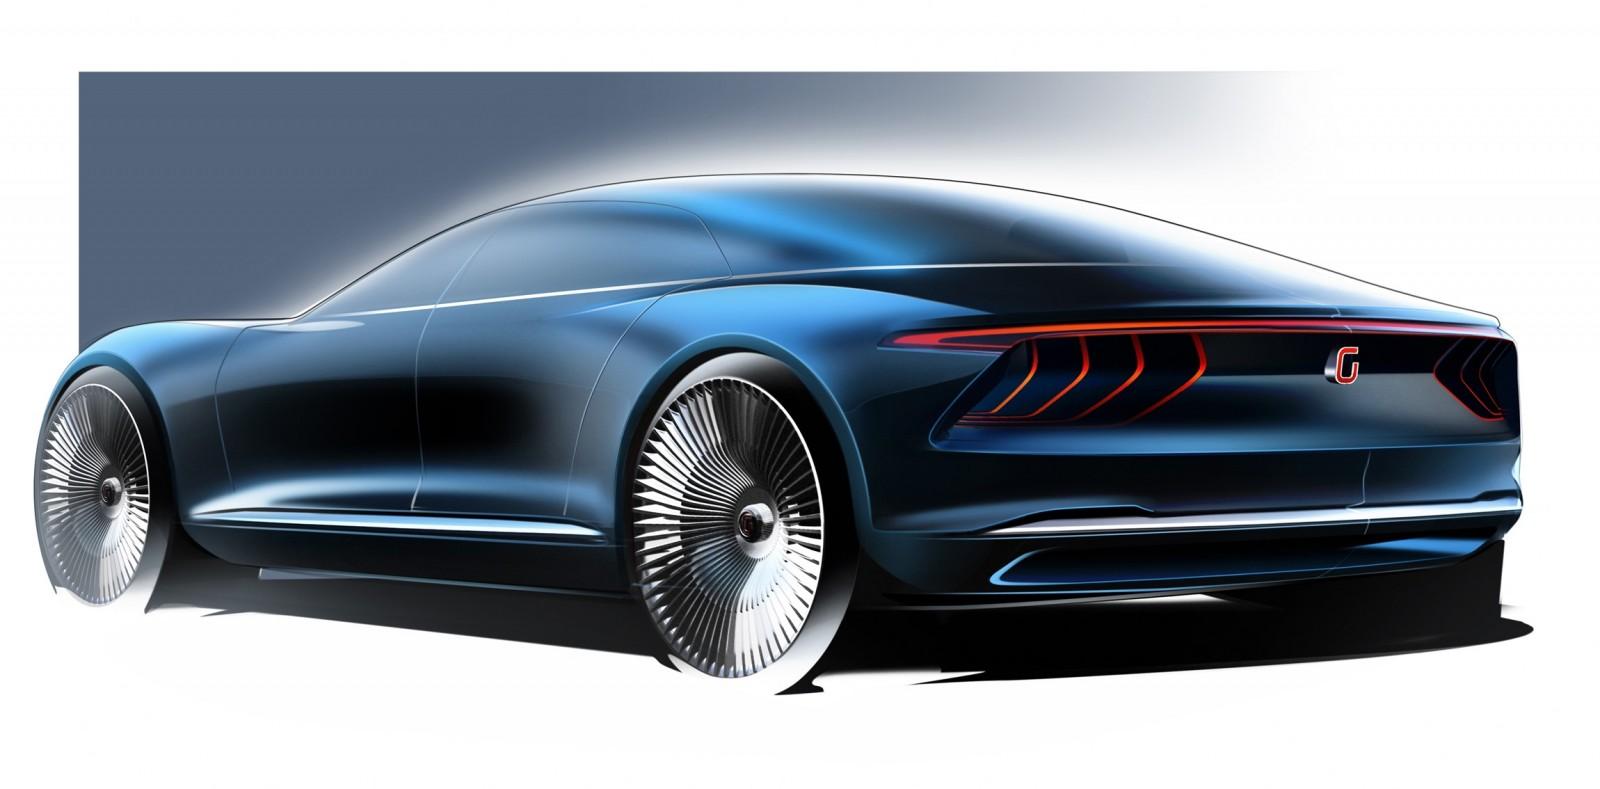 2015 ItalDesign Giugiaro GEA Concept 14